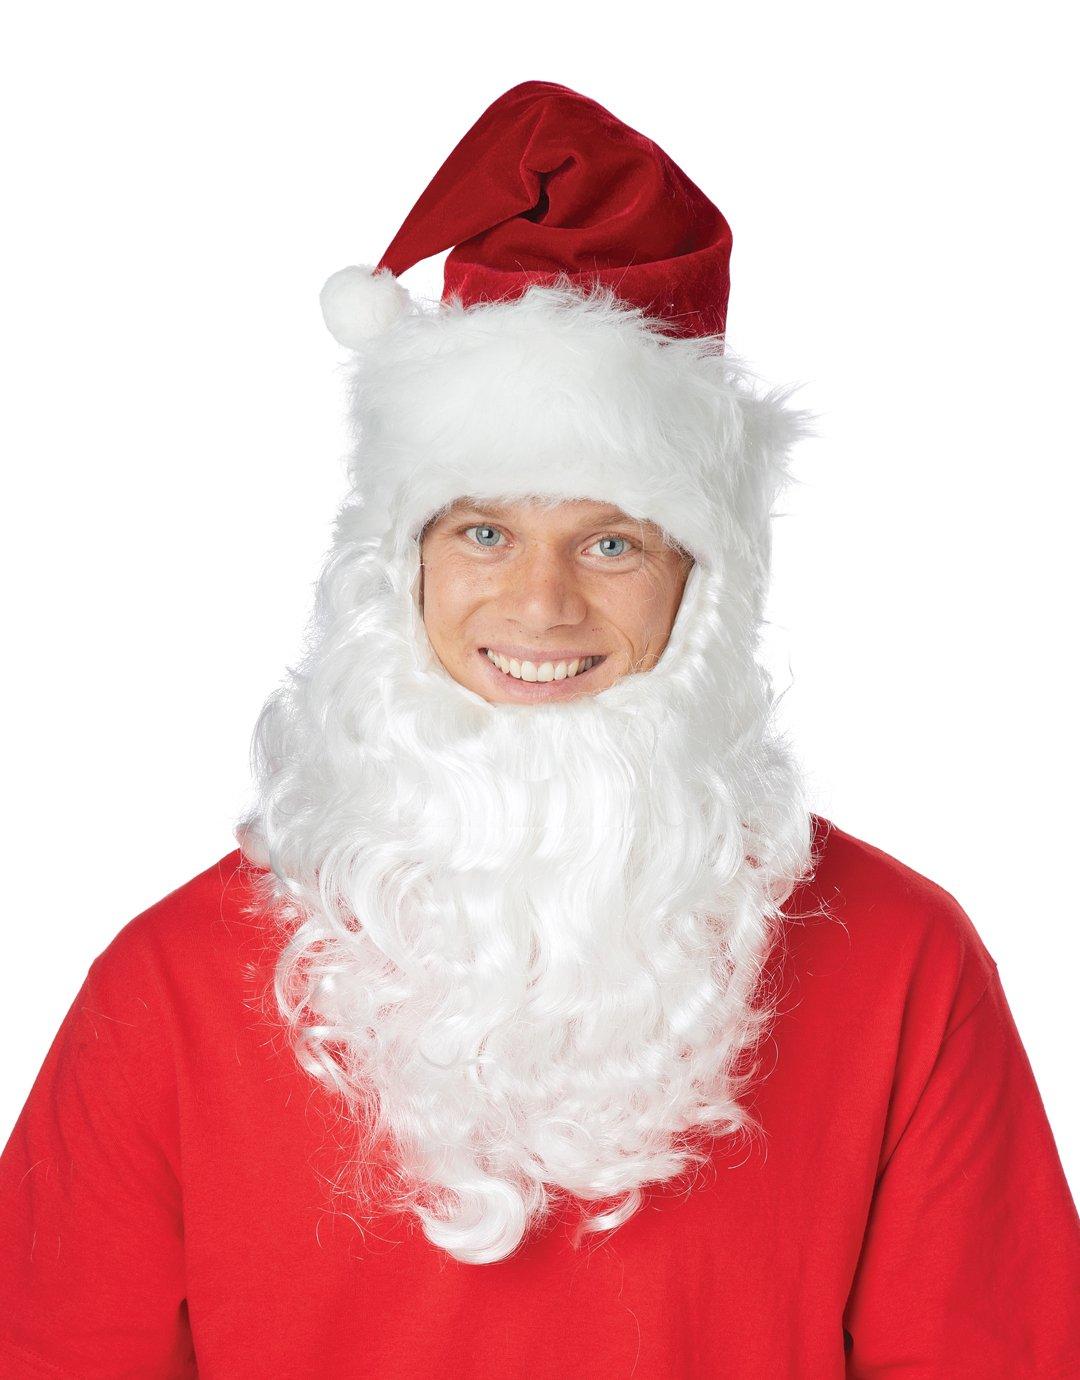 Santa Claus Get Up Saint Nicholas Adult Costume Beard & Hat #60660